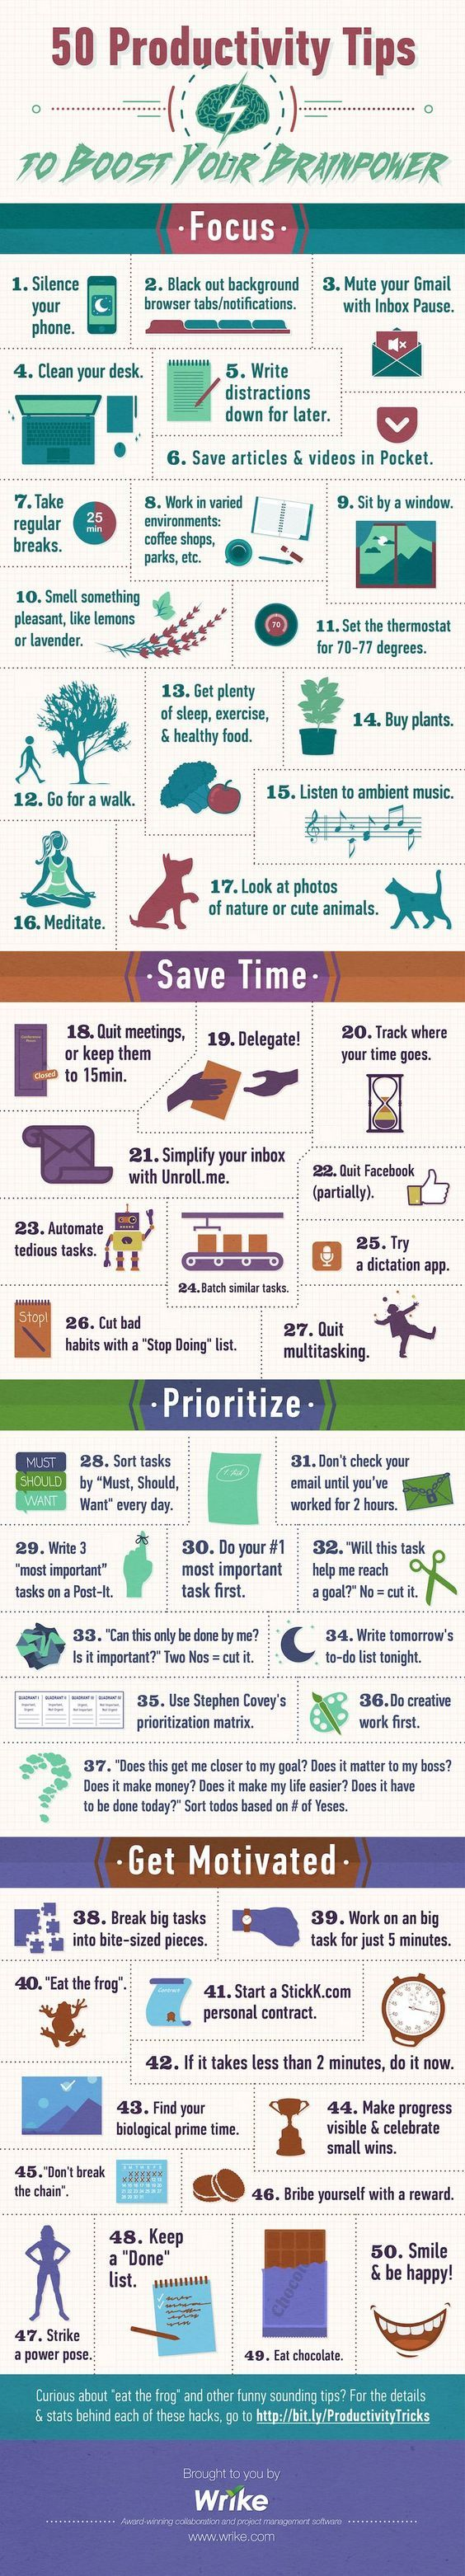 50 Ways to Improve your Productivity | THE UT.LAB | Productivity Hacks *